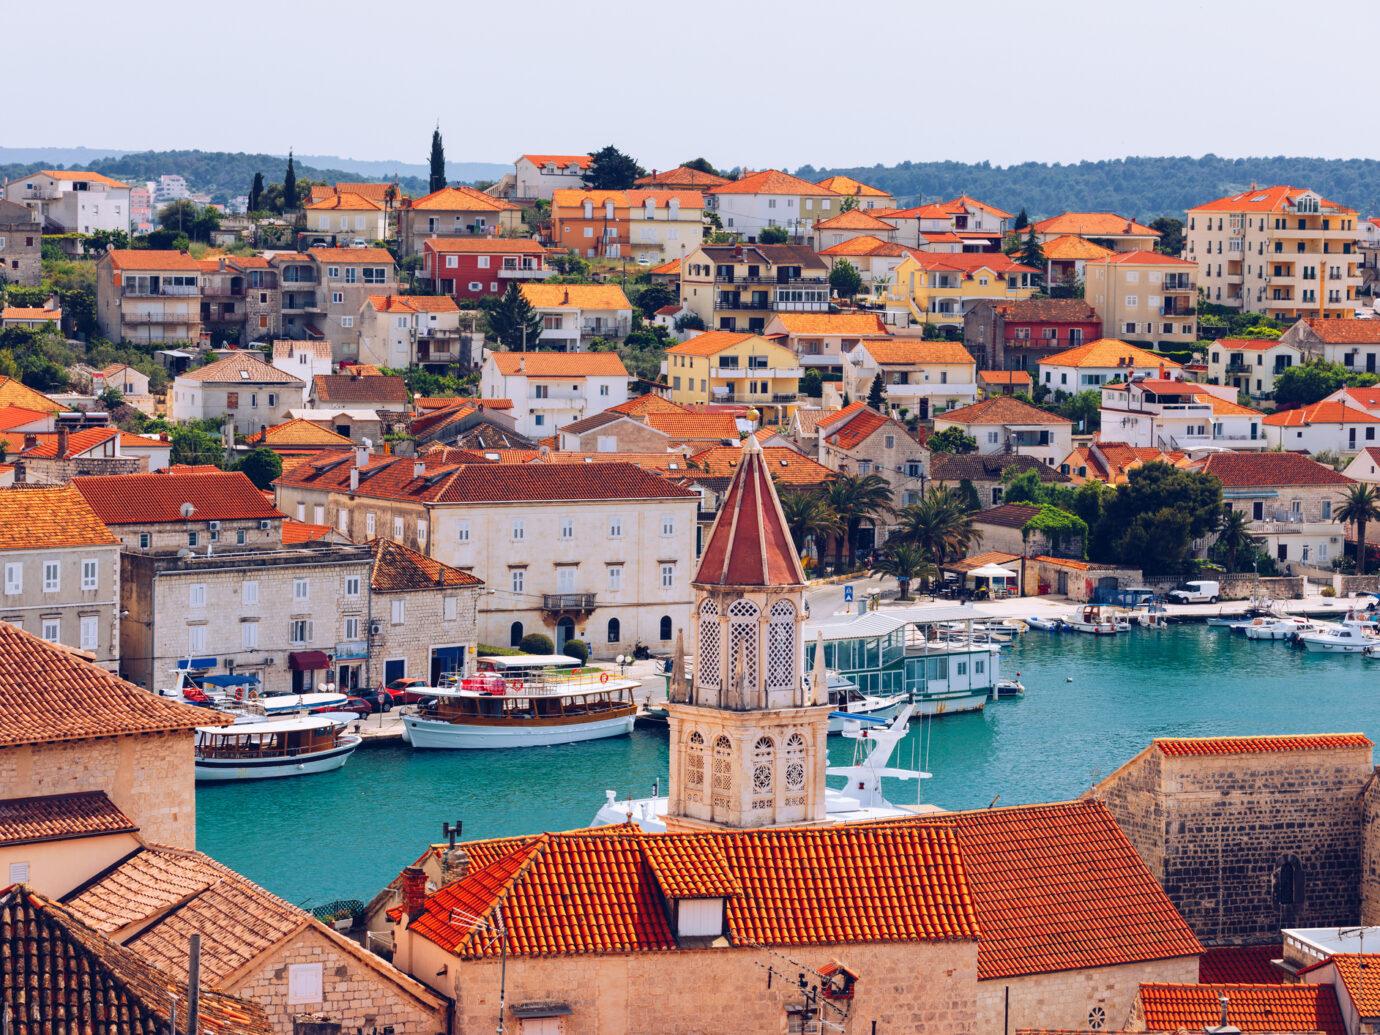 Historic buildings on promenade in Trogir, Croatia.